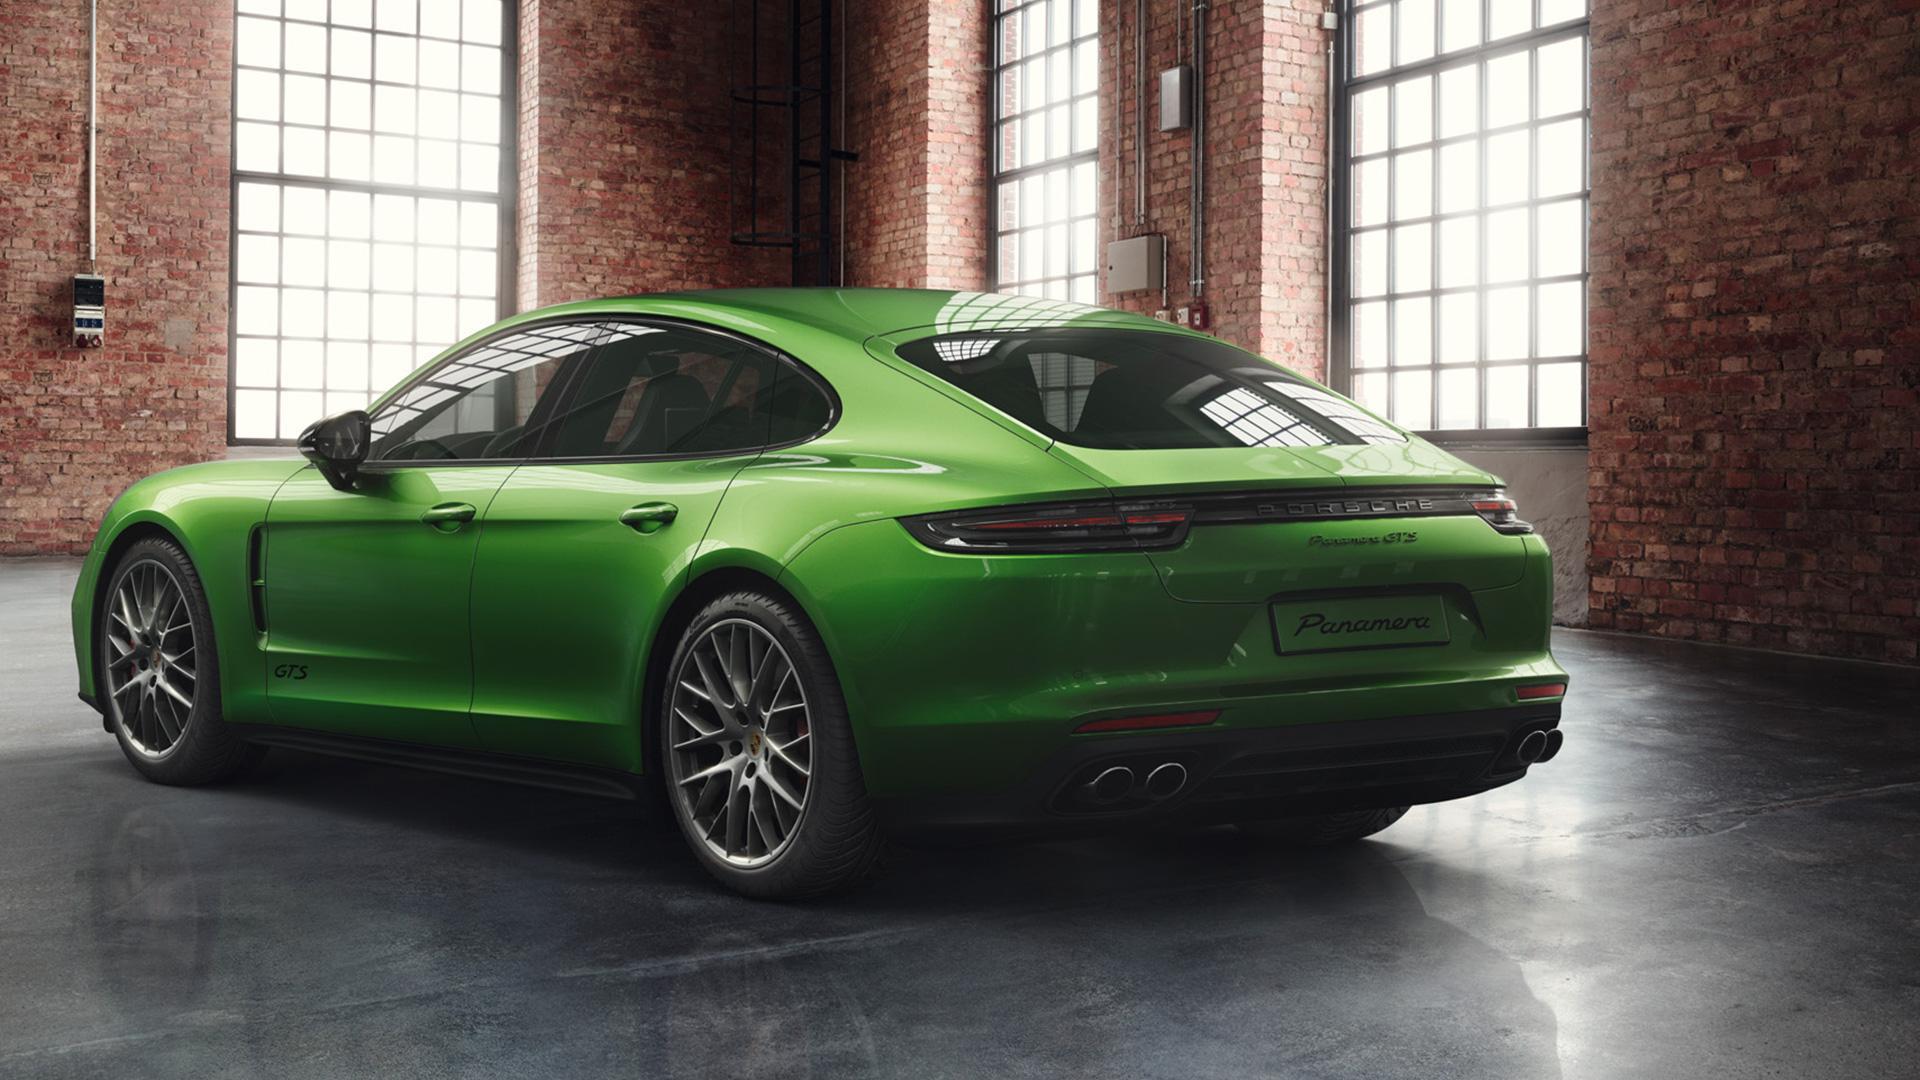 Porsche Panamera GTS in Mamba Green (1)